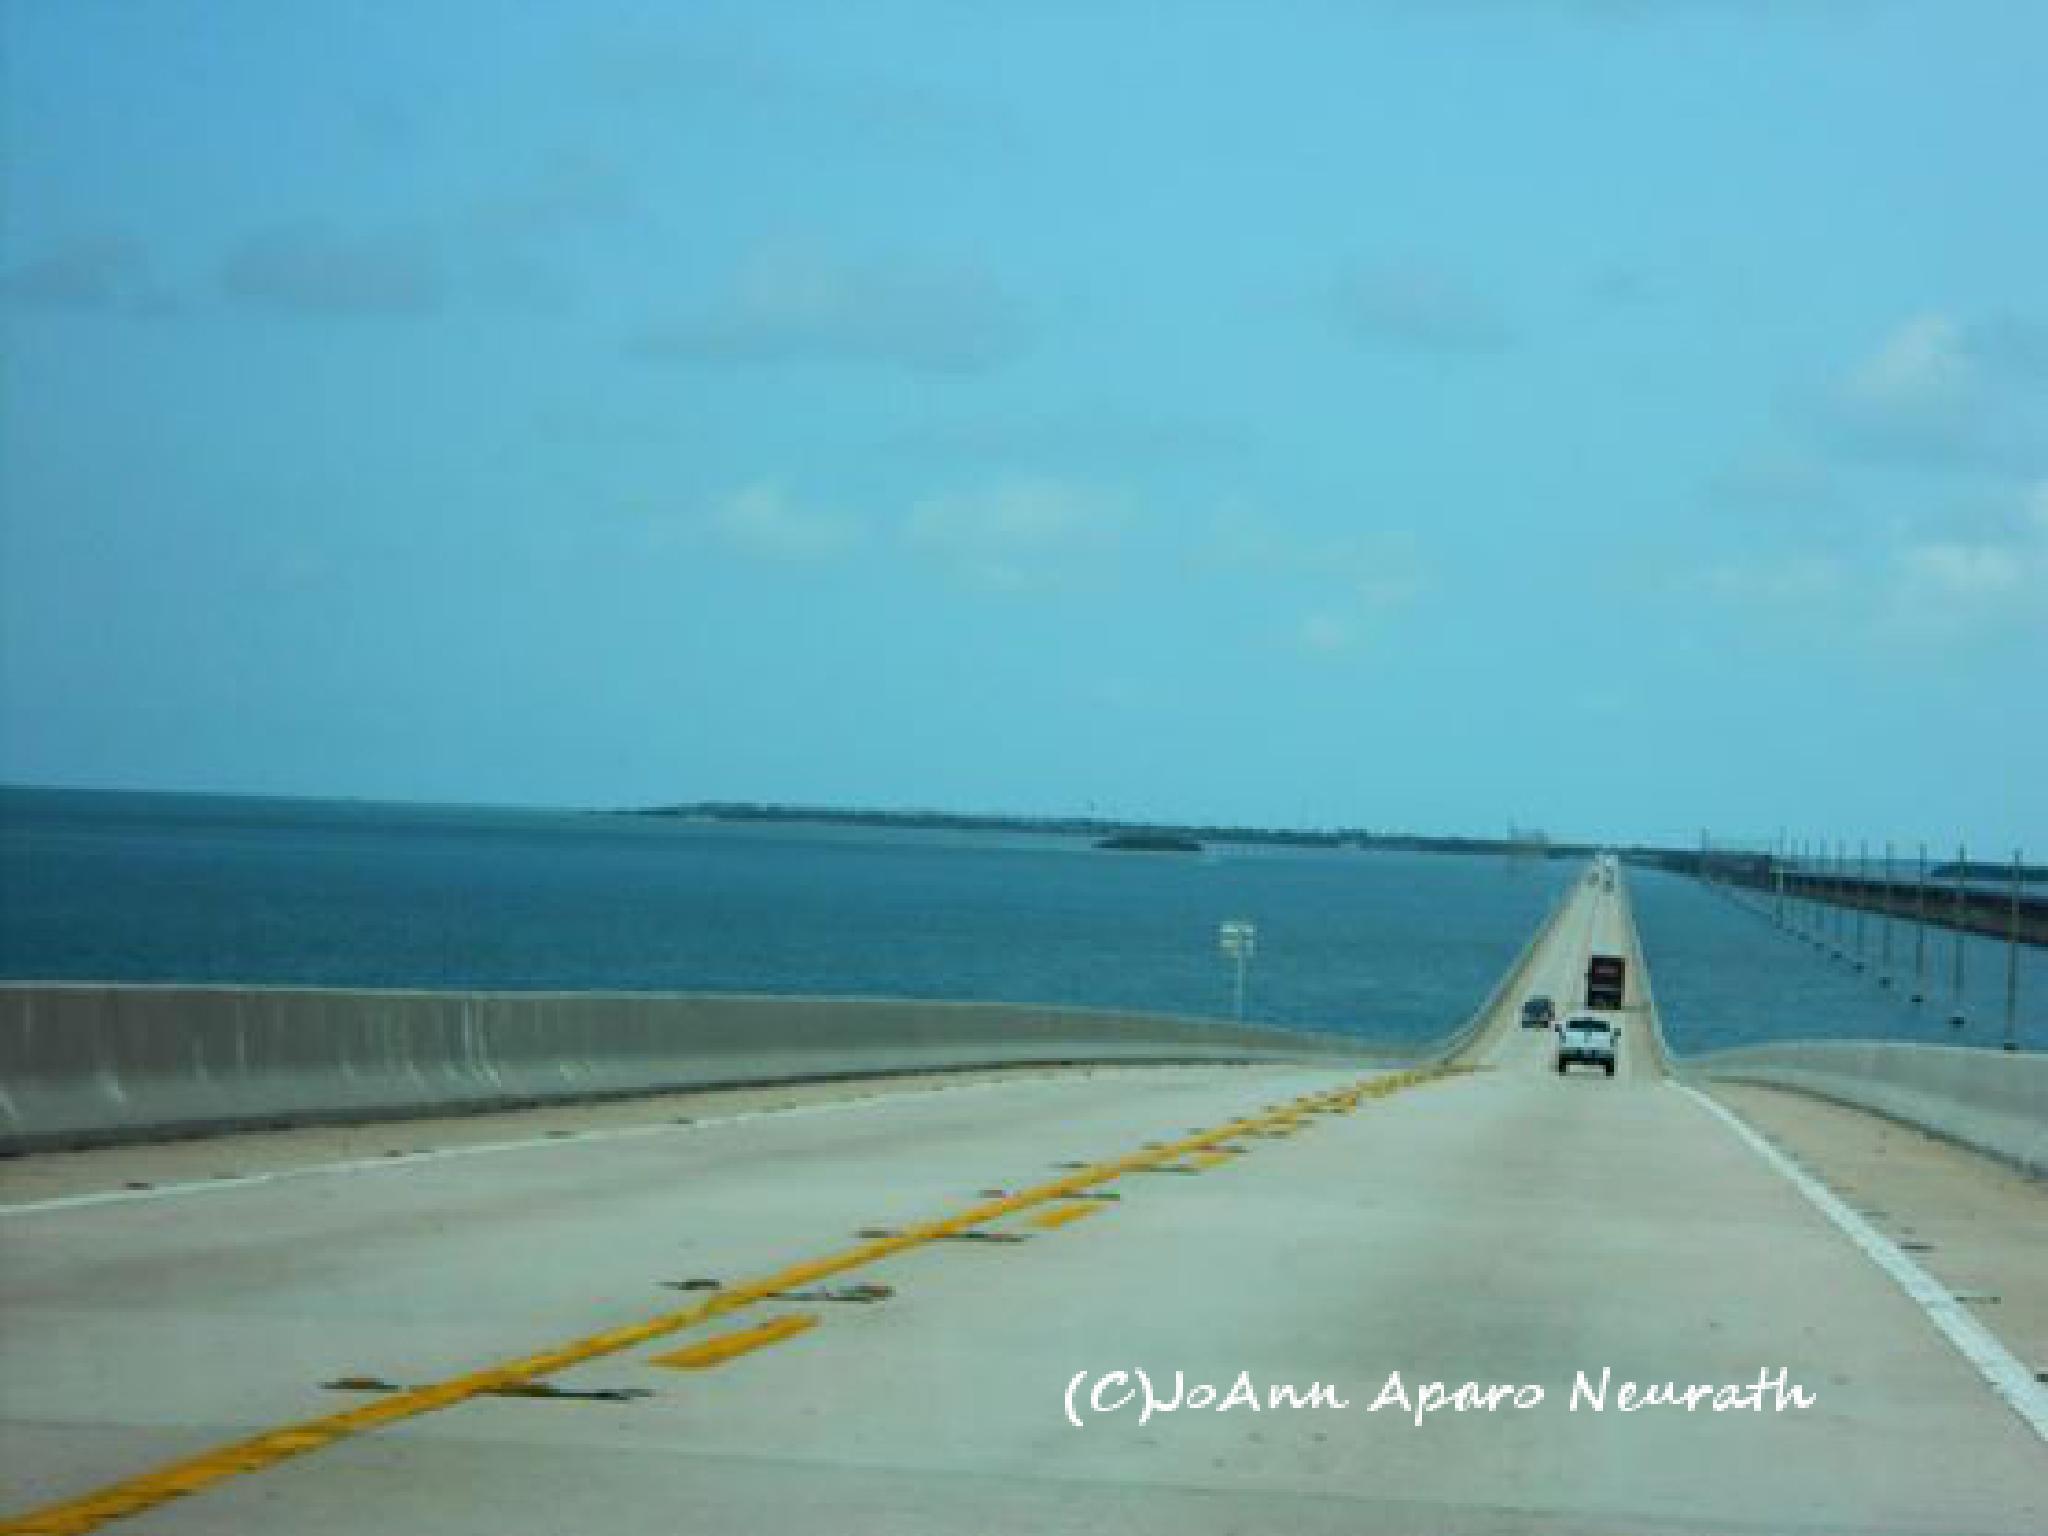 7 Mile Bridge, Florida Keys by JoAnn.Aparo.Neurath